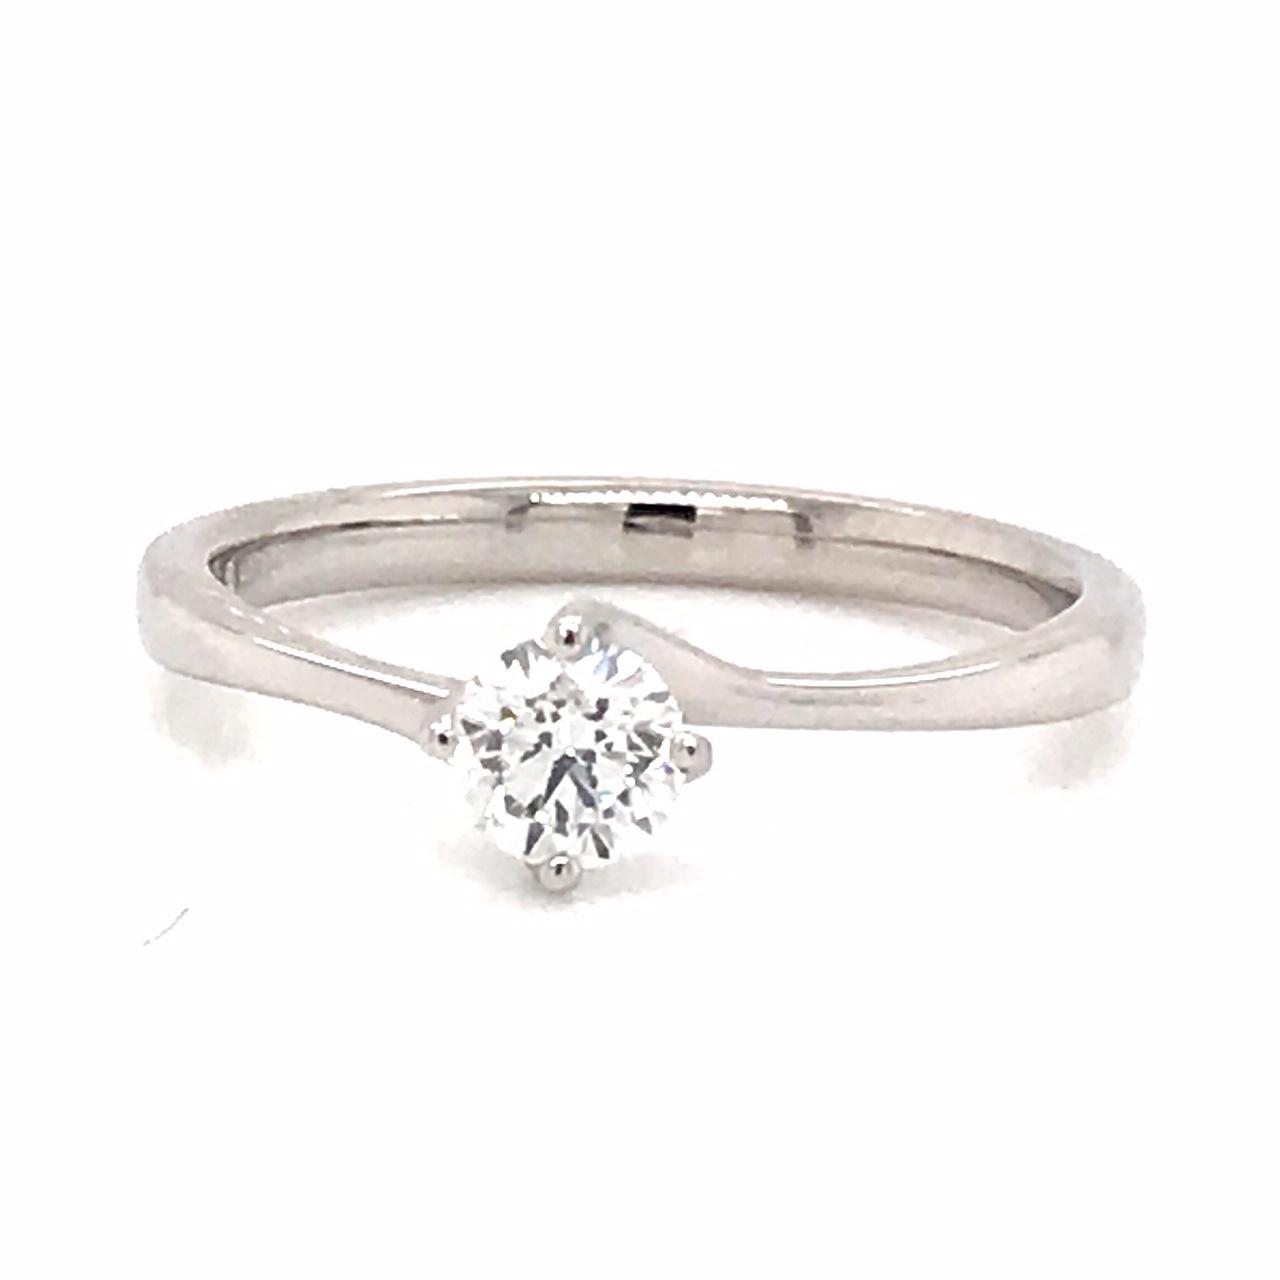 Platinum and Diamond Twist Engagement Ring 0.33 E VS1